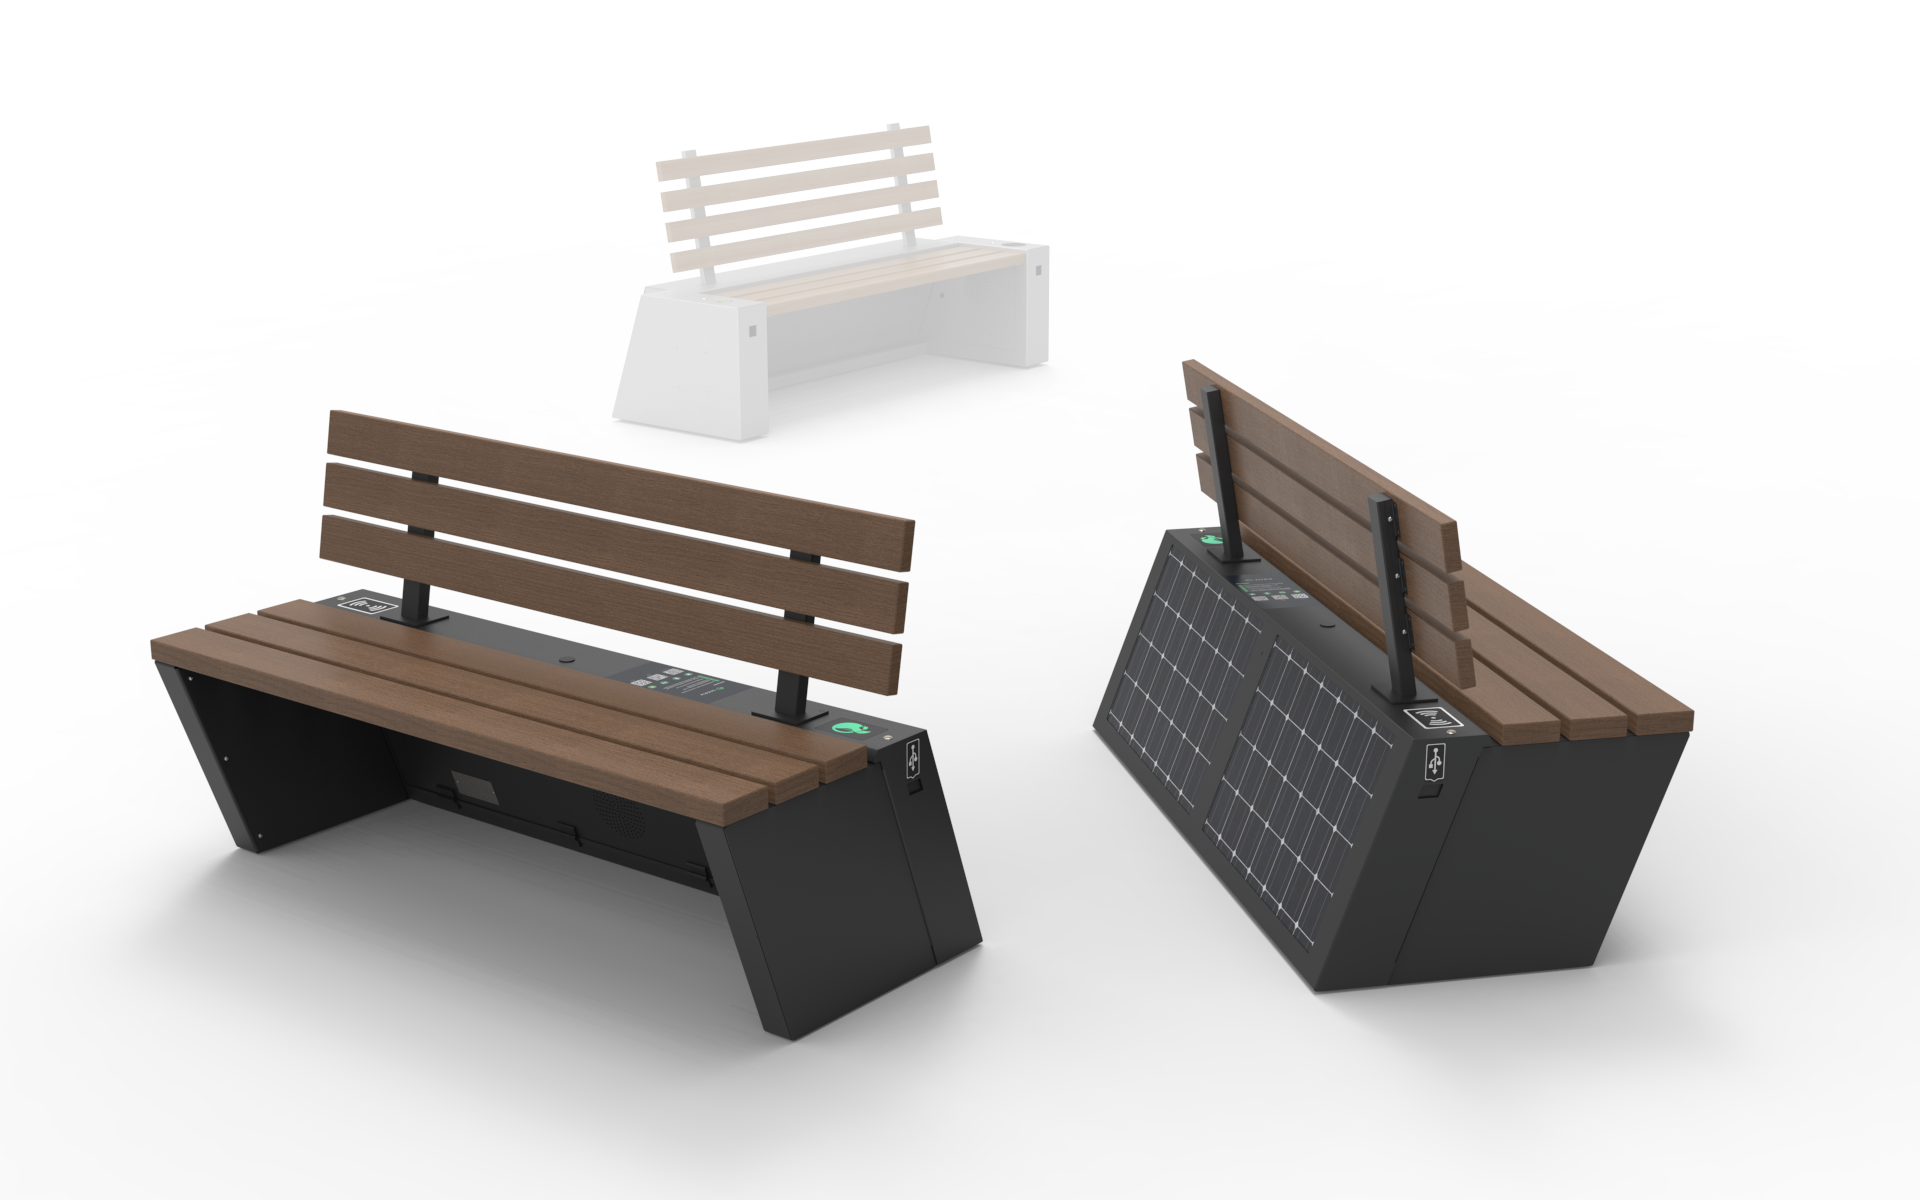 The latest version of SEEDiA Urban solar benches